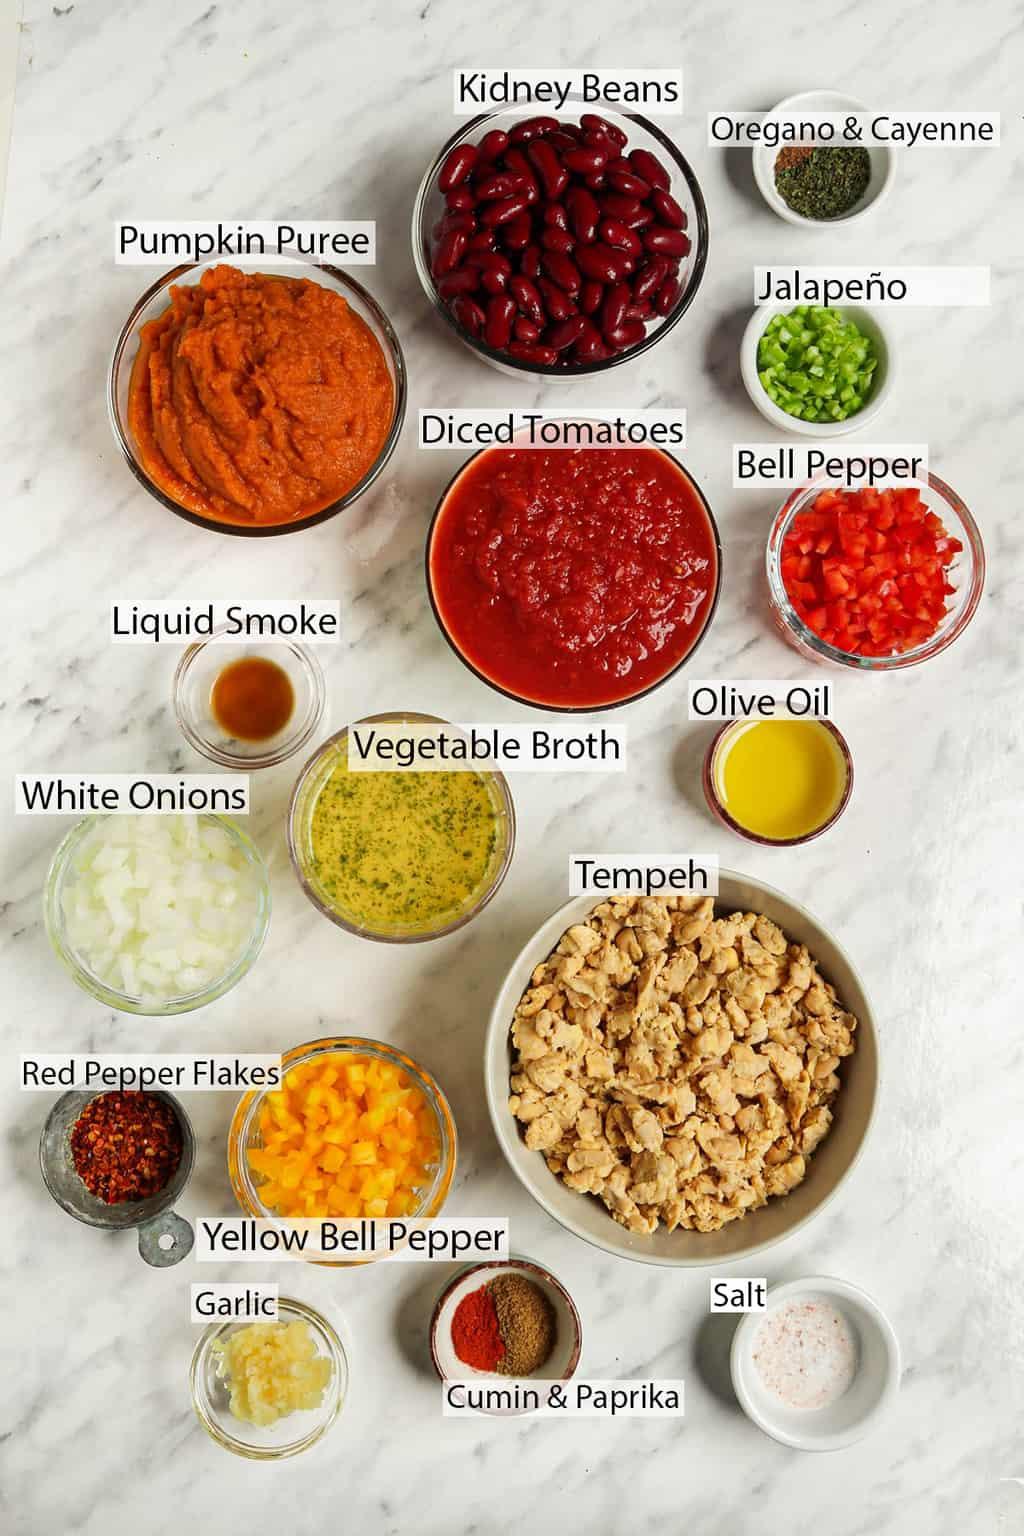 ingredients shot of gluten-free vegan pumpkin chili featuring kidney beans, oregano, cayenne, jalapeño, pumpkin puree, tomatoes, liquid smoke, olive oil, vegetable broth, white onions, tempeh, red pepper flakes, yellow bell pepper, garlic, salt, cumin, paprika,